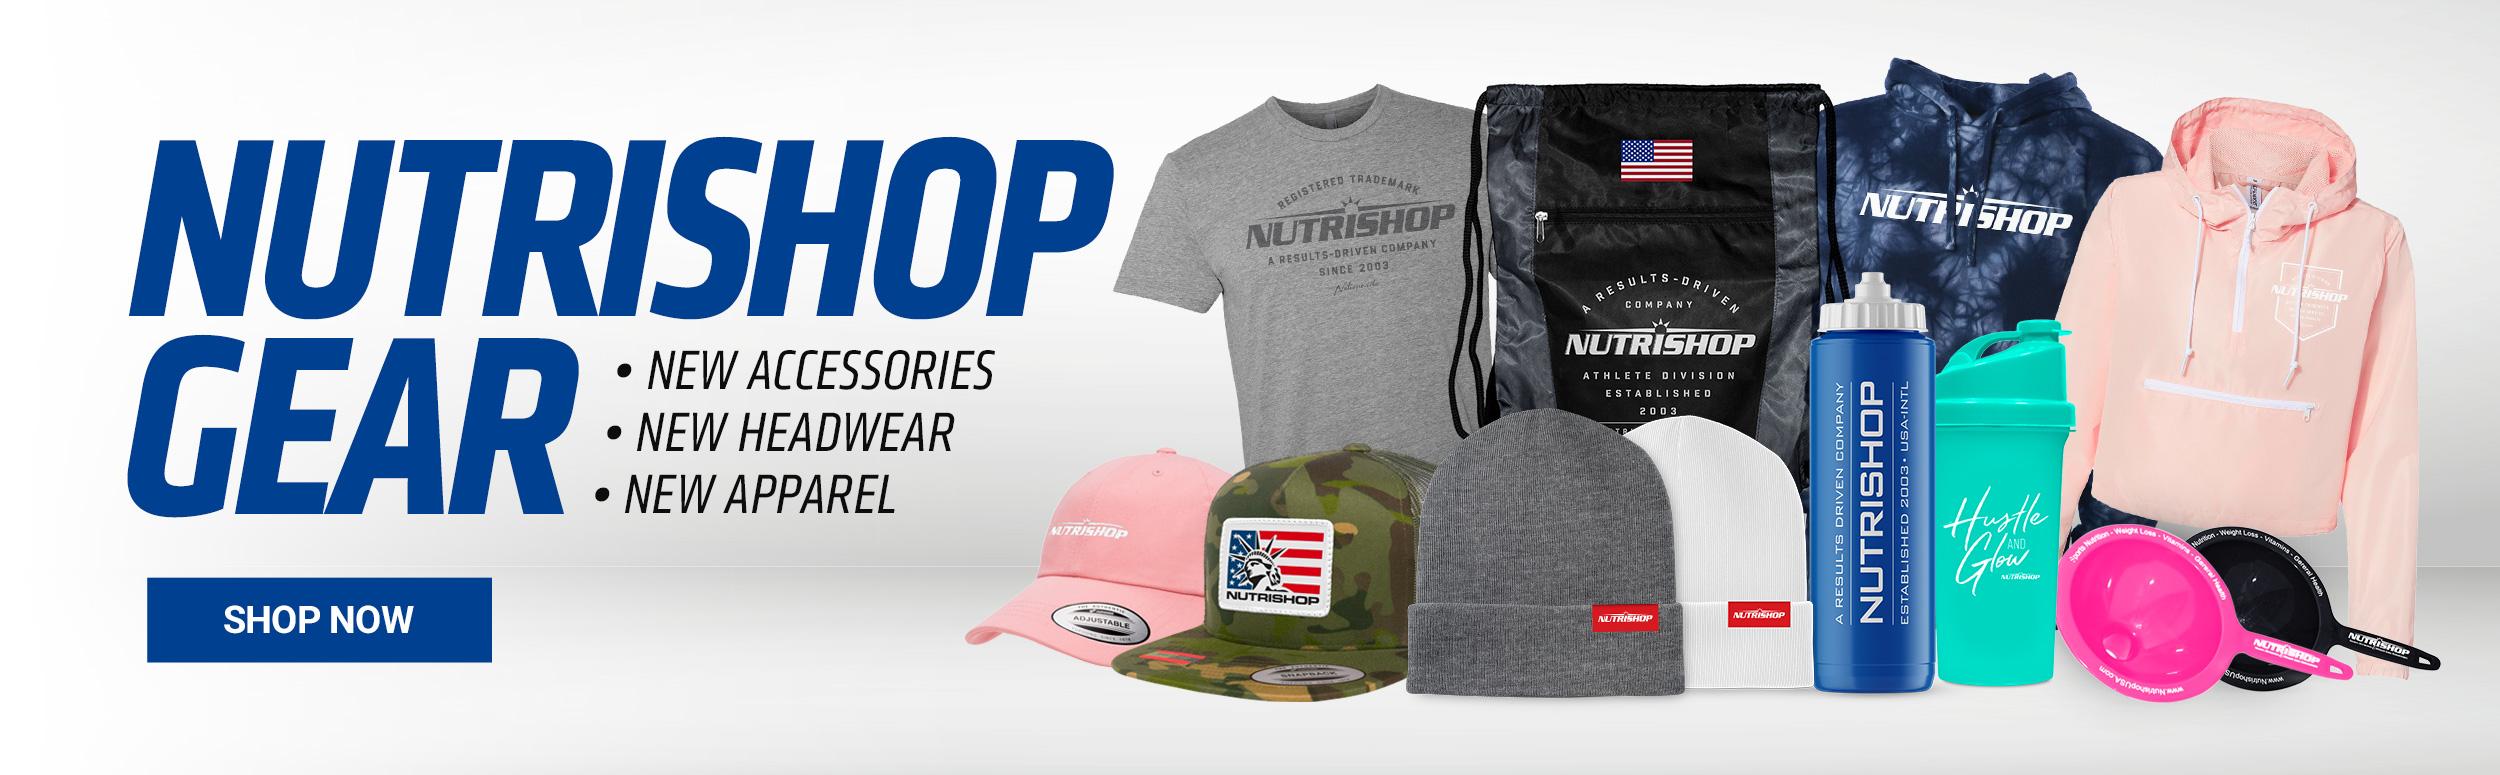 Nutrishop Gear - New Accessories - New Headwear - New Apparel - Shop Now